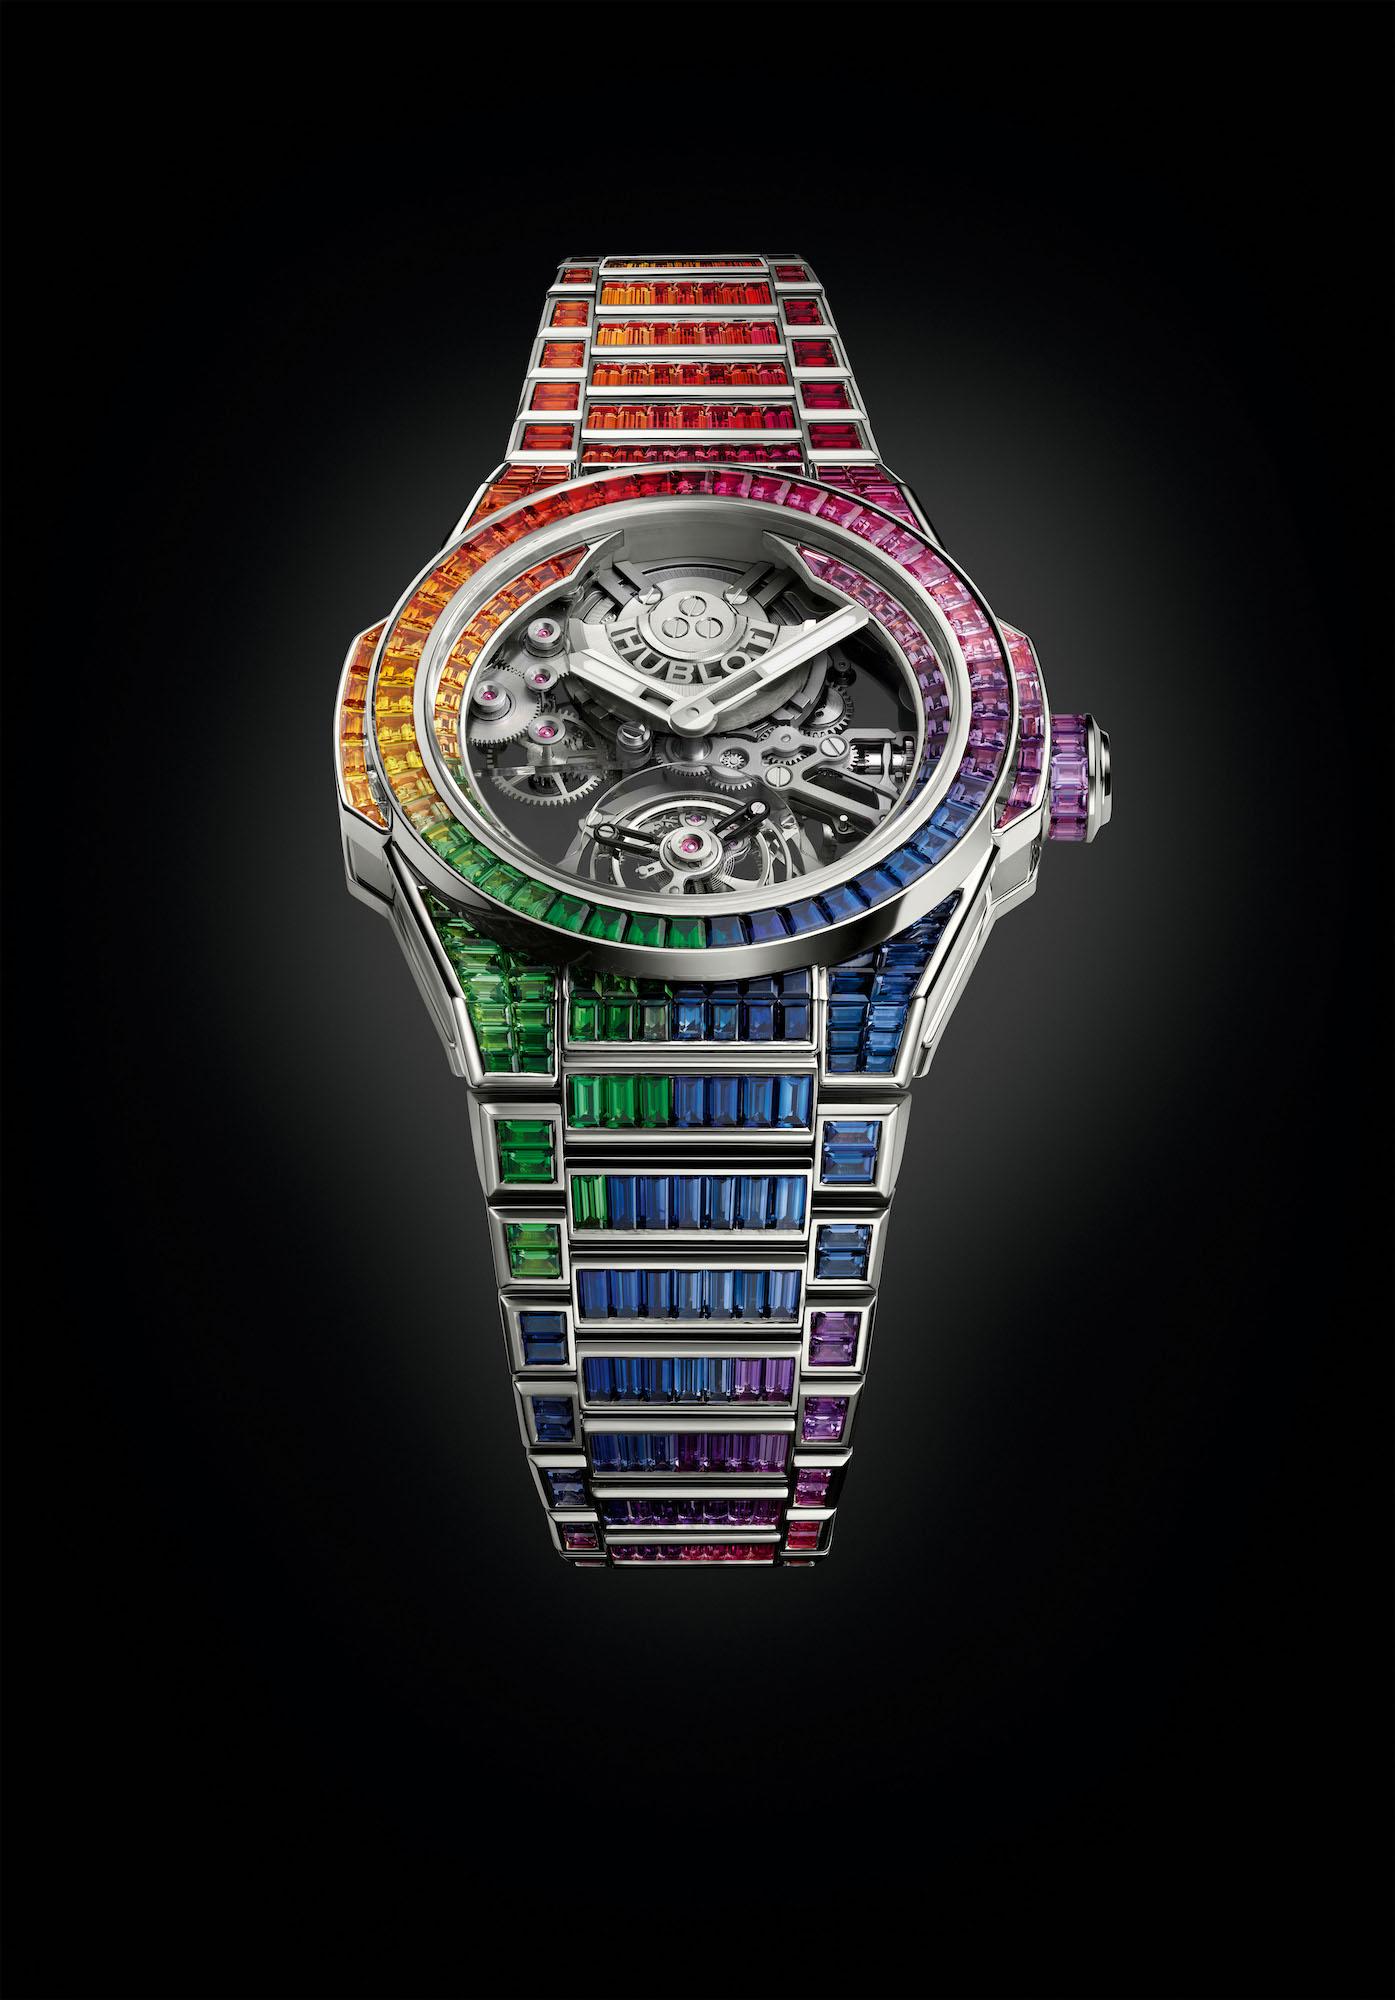 Hublot Big Bang Integral Tourbillon Rainbow 455.WX.9900.WX.9999